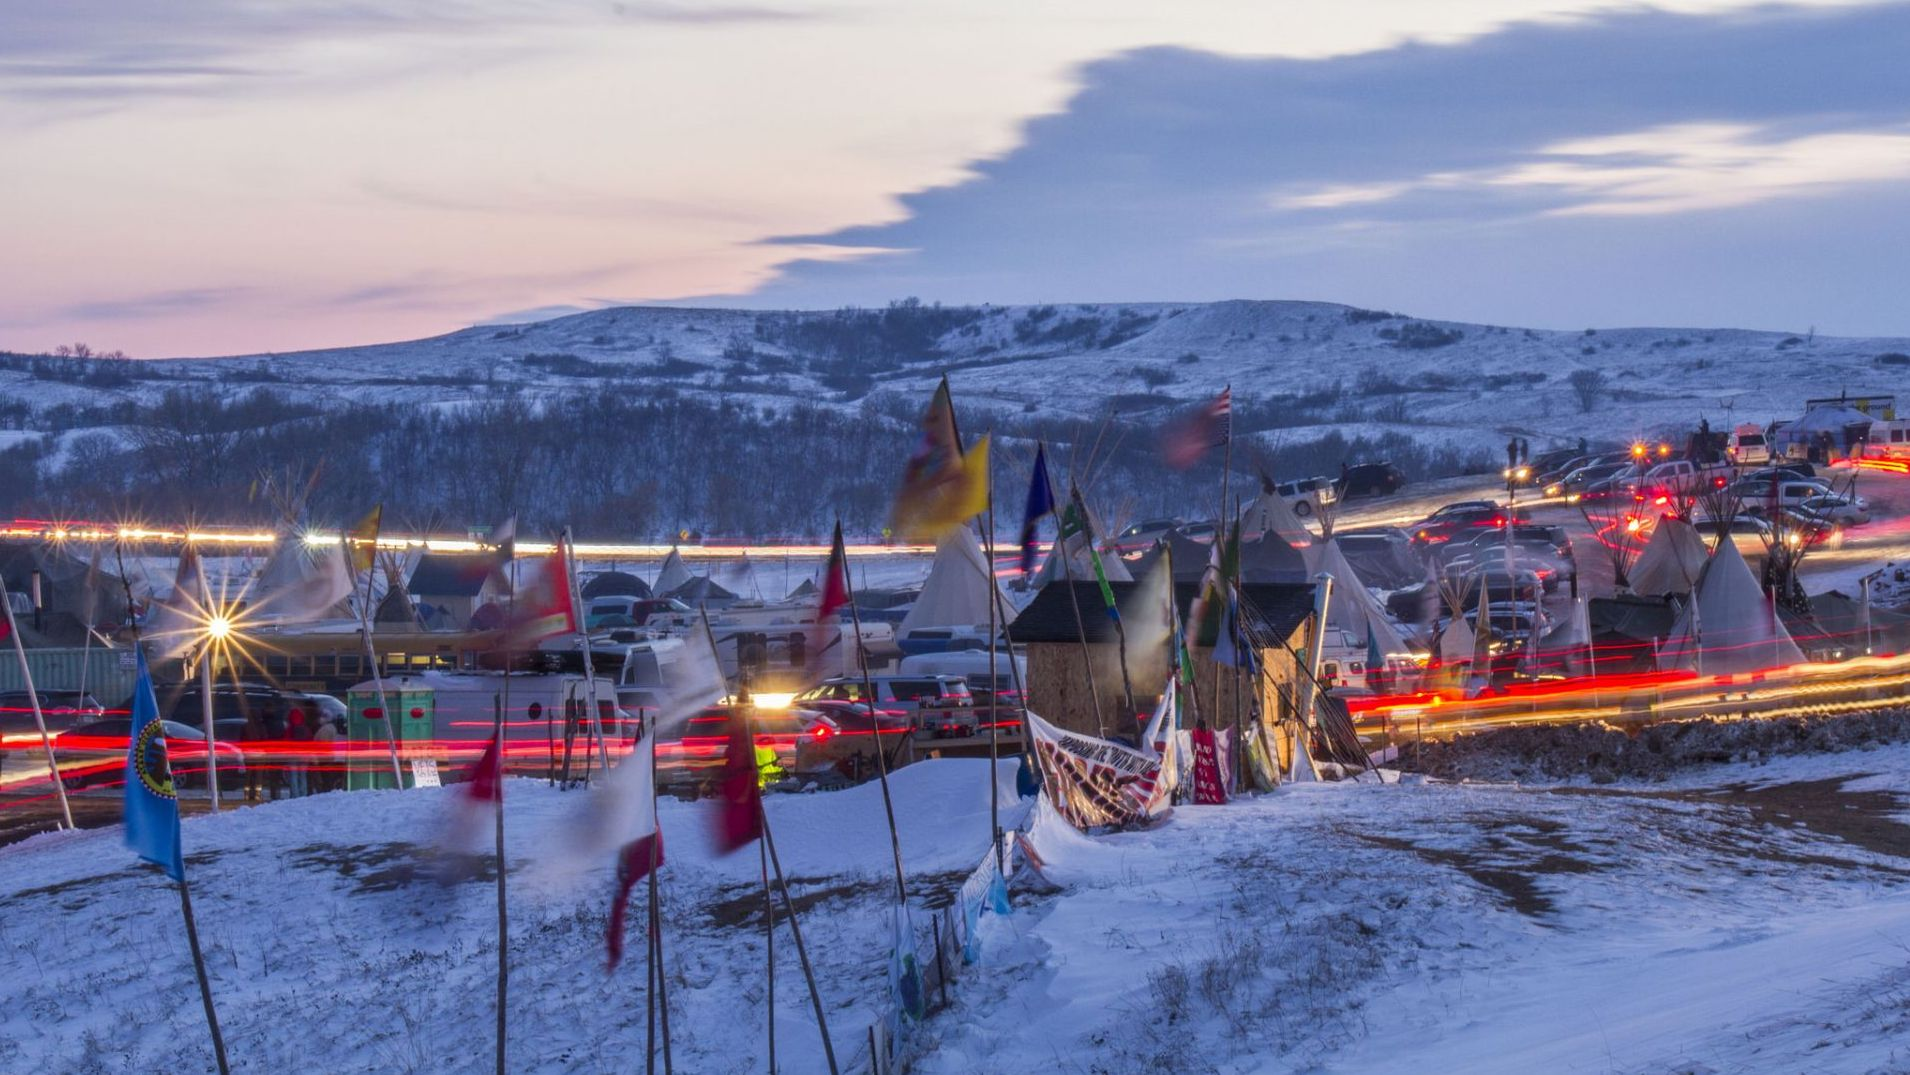 Photo of Standing Rock encampment taken on December 3, 2016, by Dark Sevier/Flickr. Not associated with film Beyond Standing Rock.